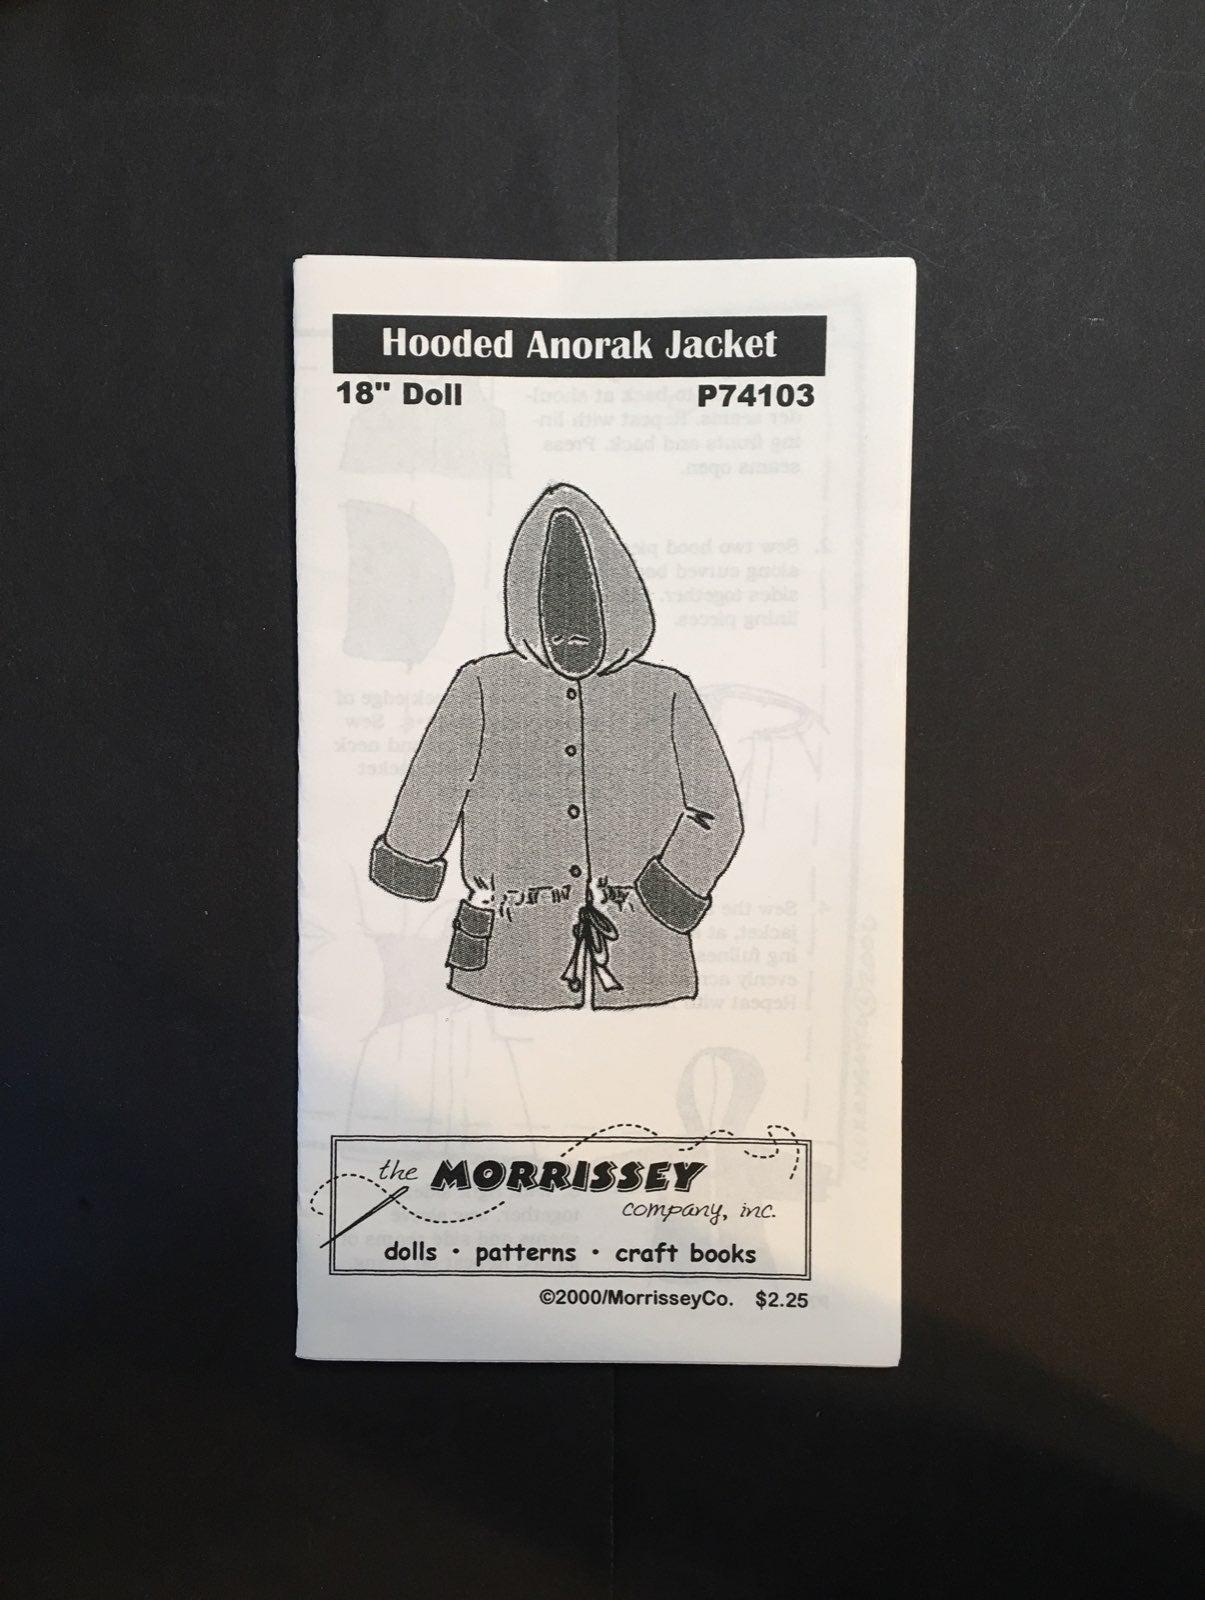 "Hooded Anorak Jacket pattern 18"" doll"